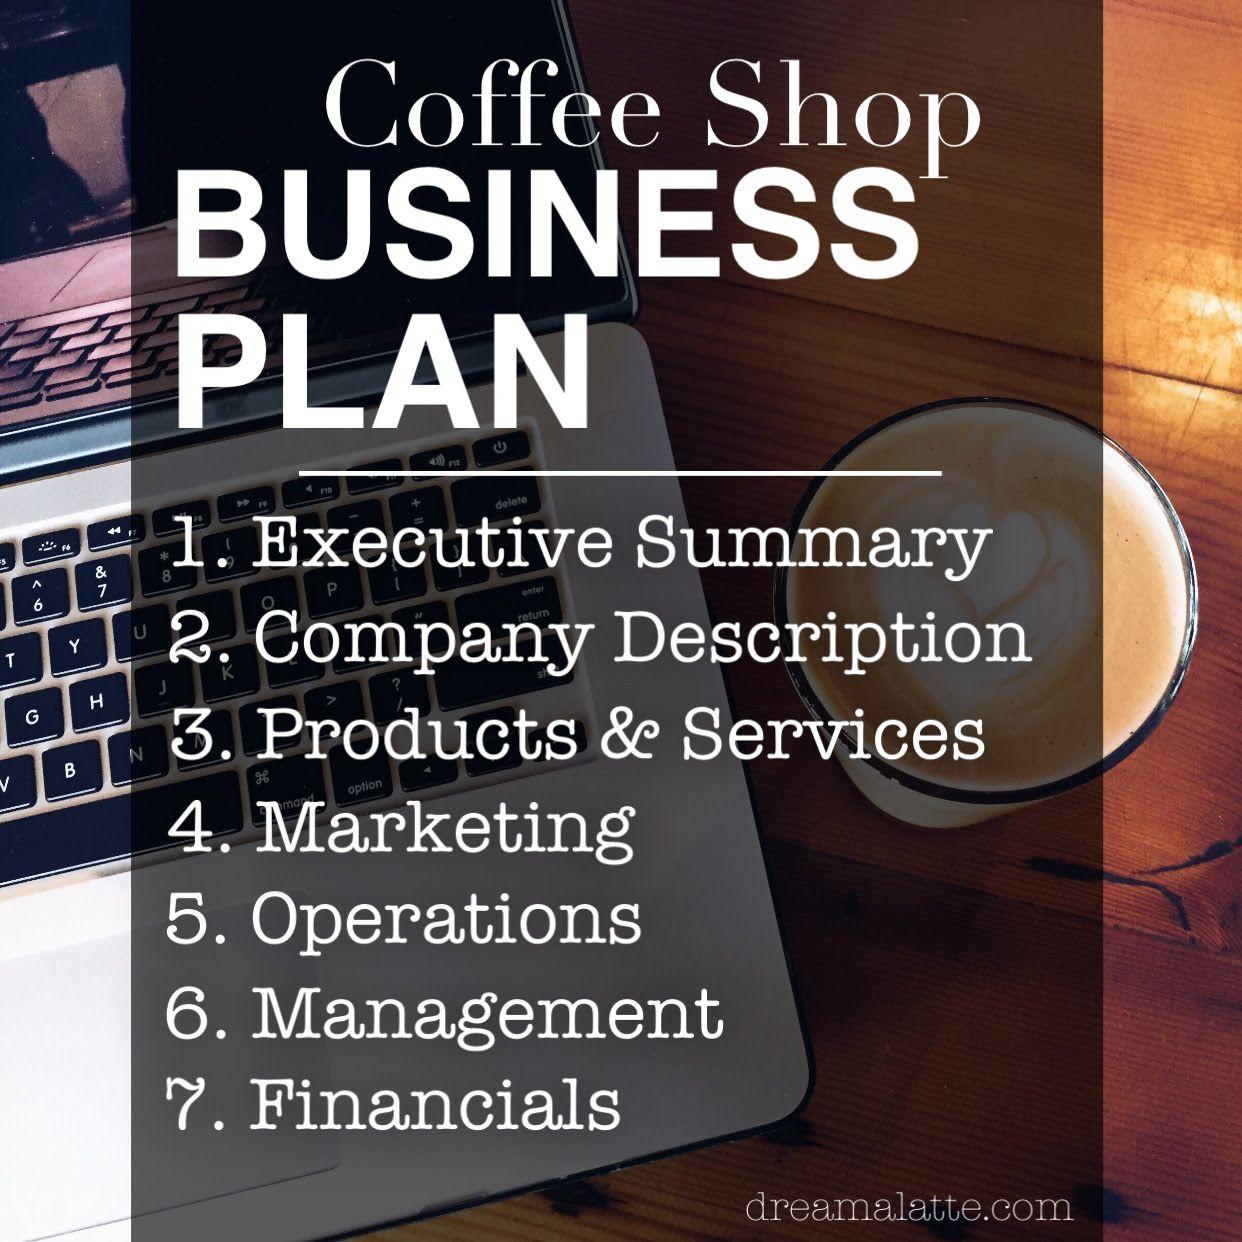 The Coffee Shop Business Plan Dream A Latte Coffee Shop Business Coffee Shop Business Plan Starting A Coffee Shop